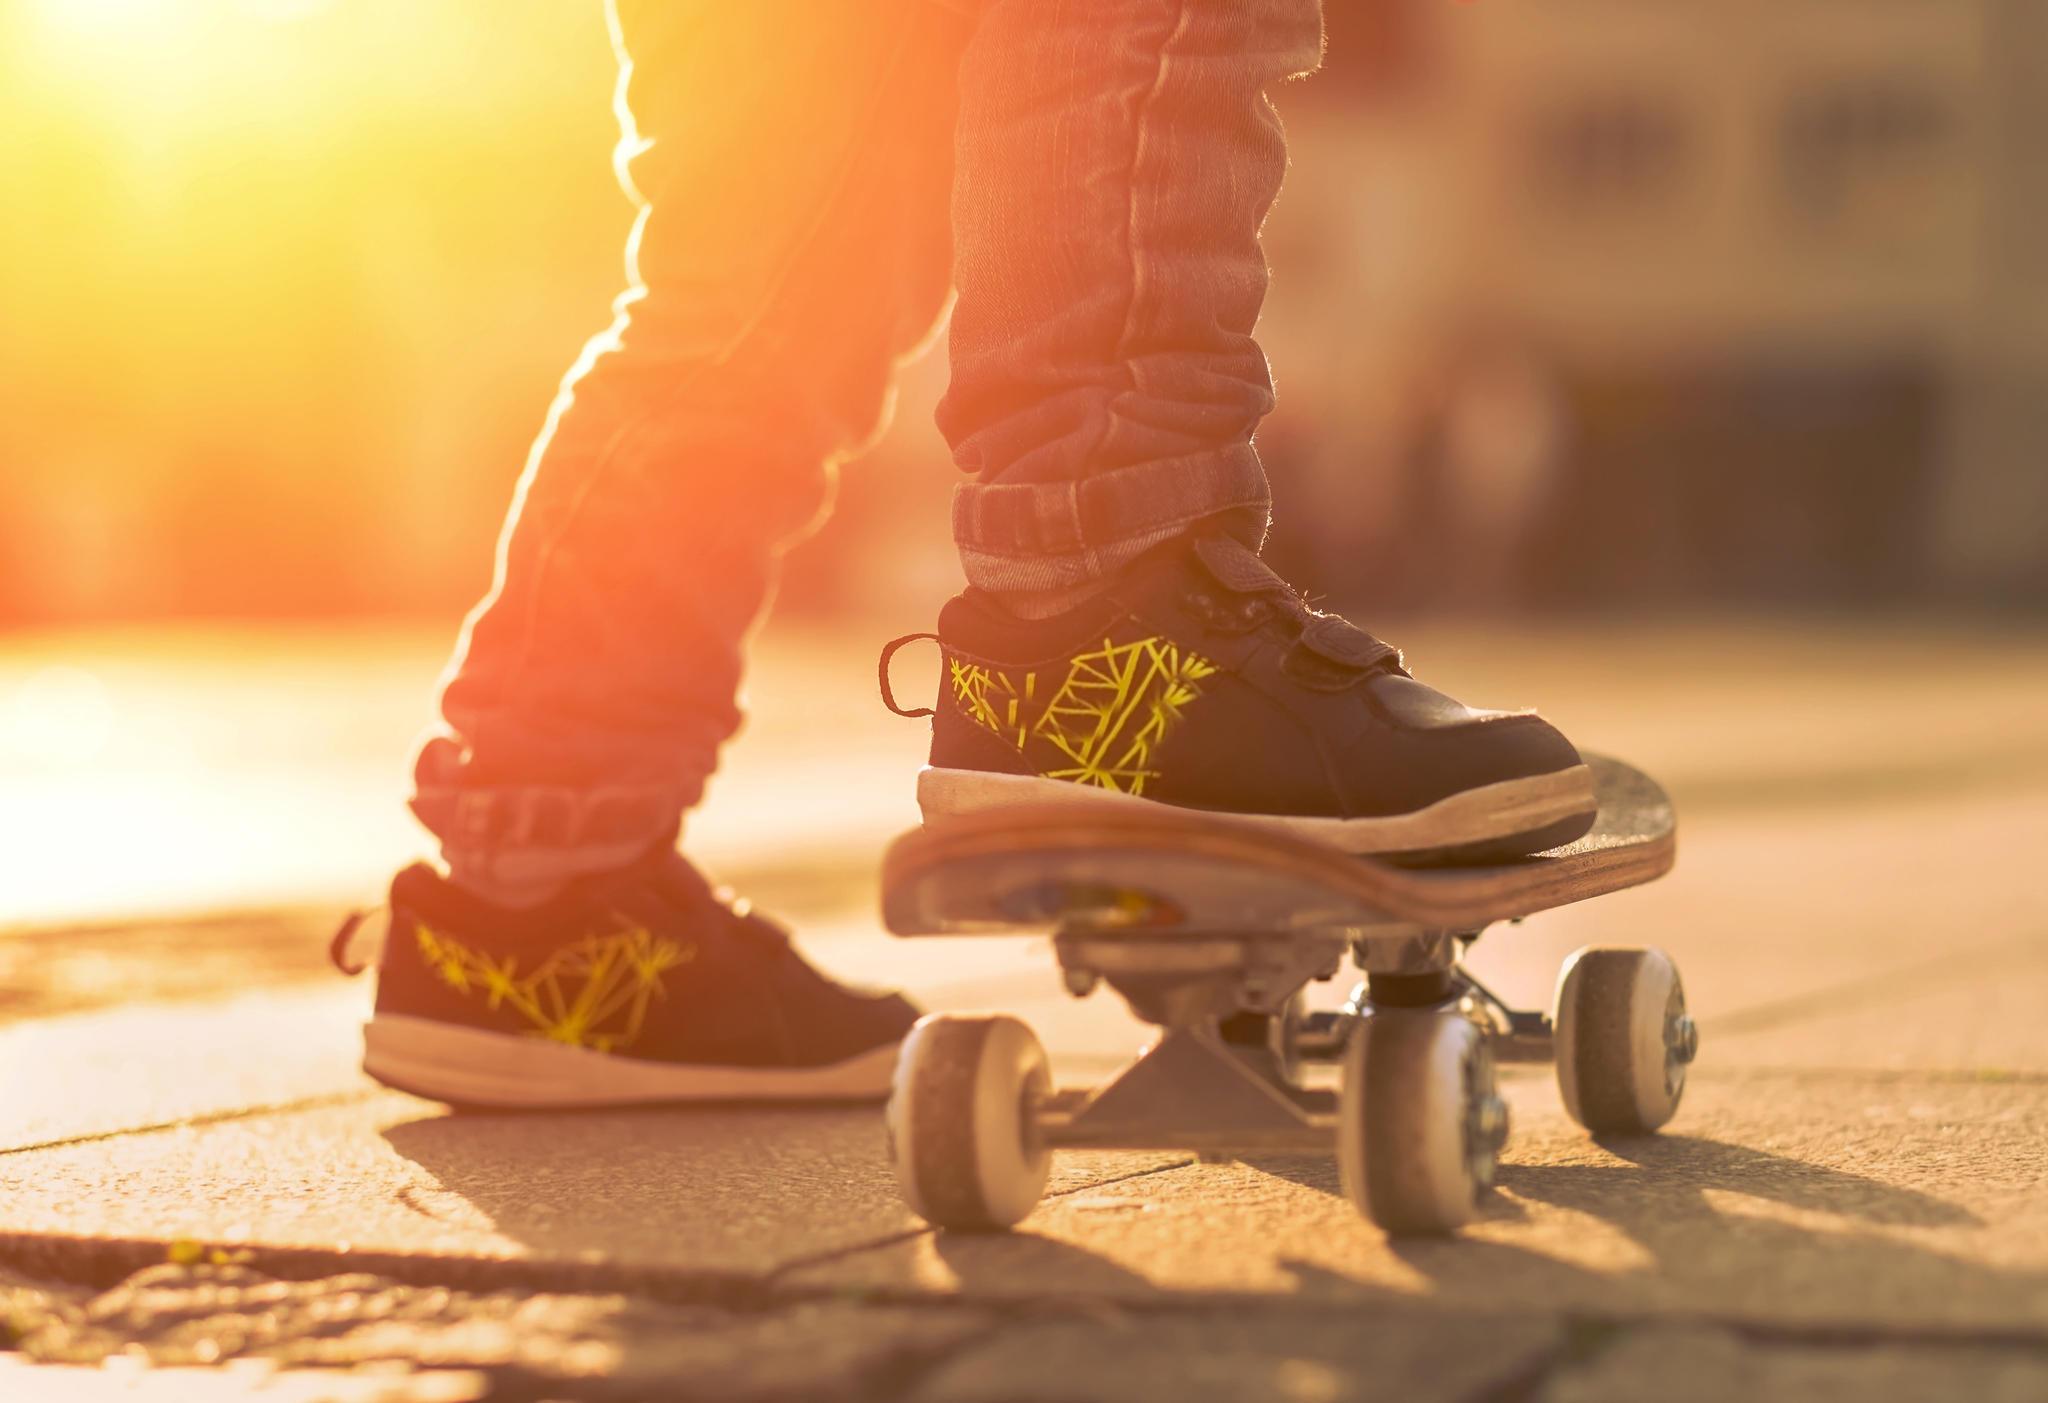 Kind in Sneakern auf Skateboard